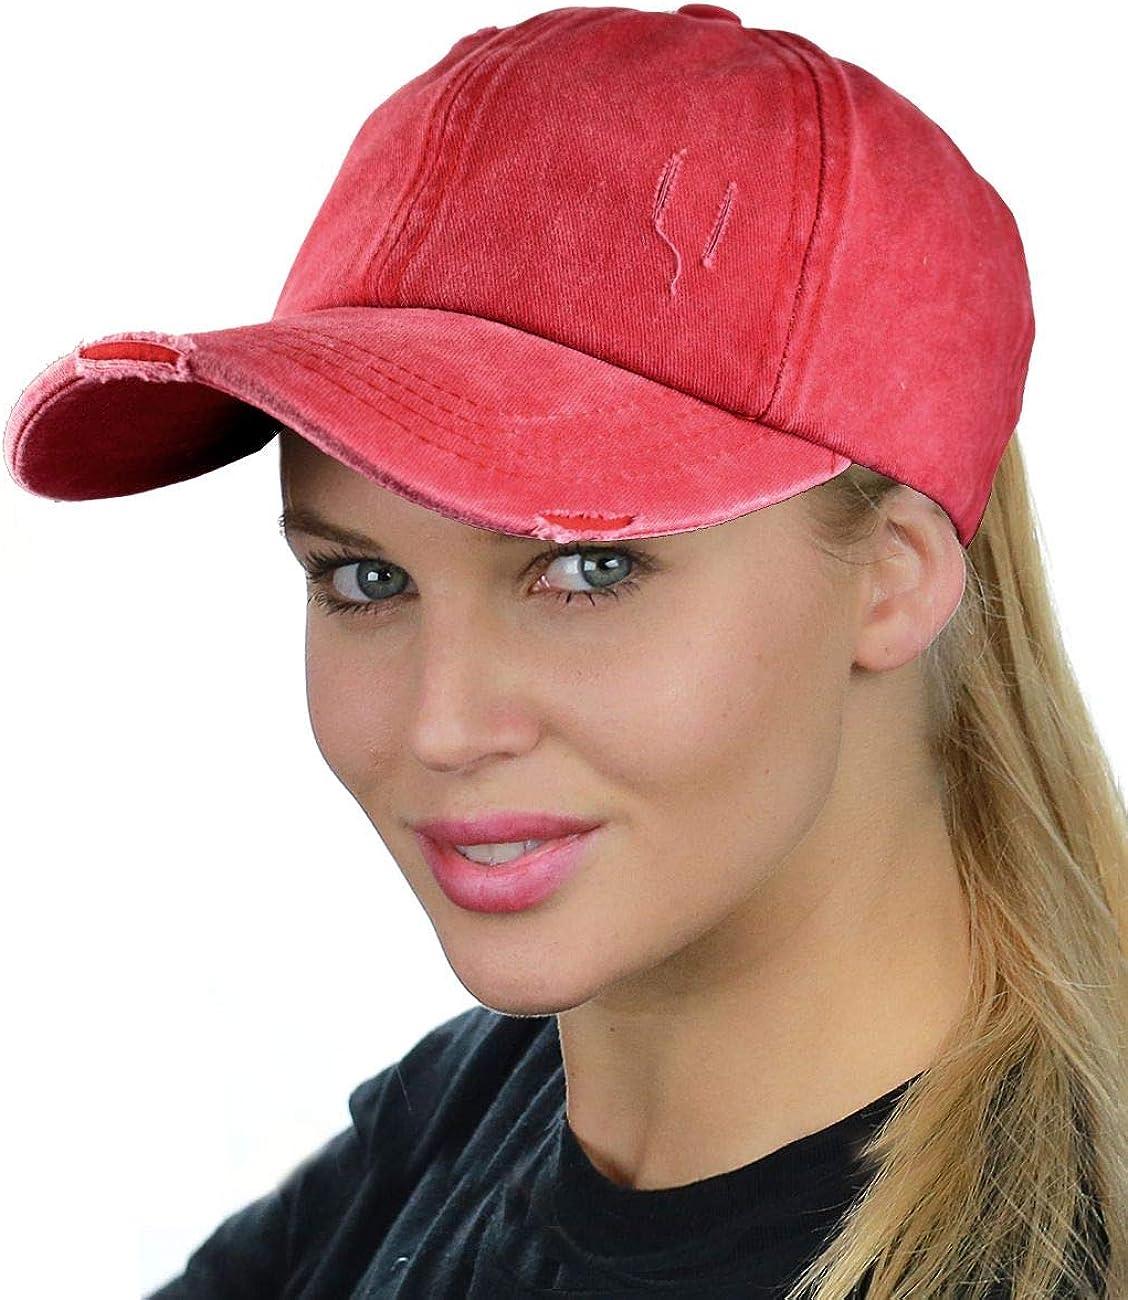 C.C Ladder Style Ponycap Adjustable Ponytail Distressed Washed Denim Baseball Cap